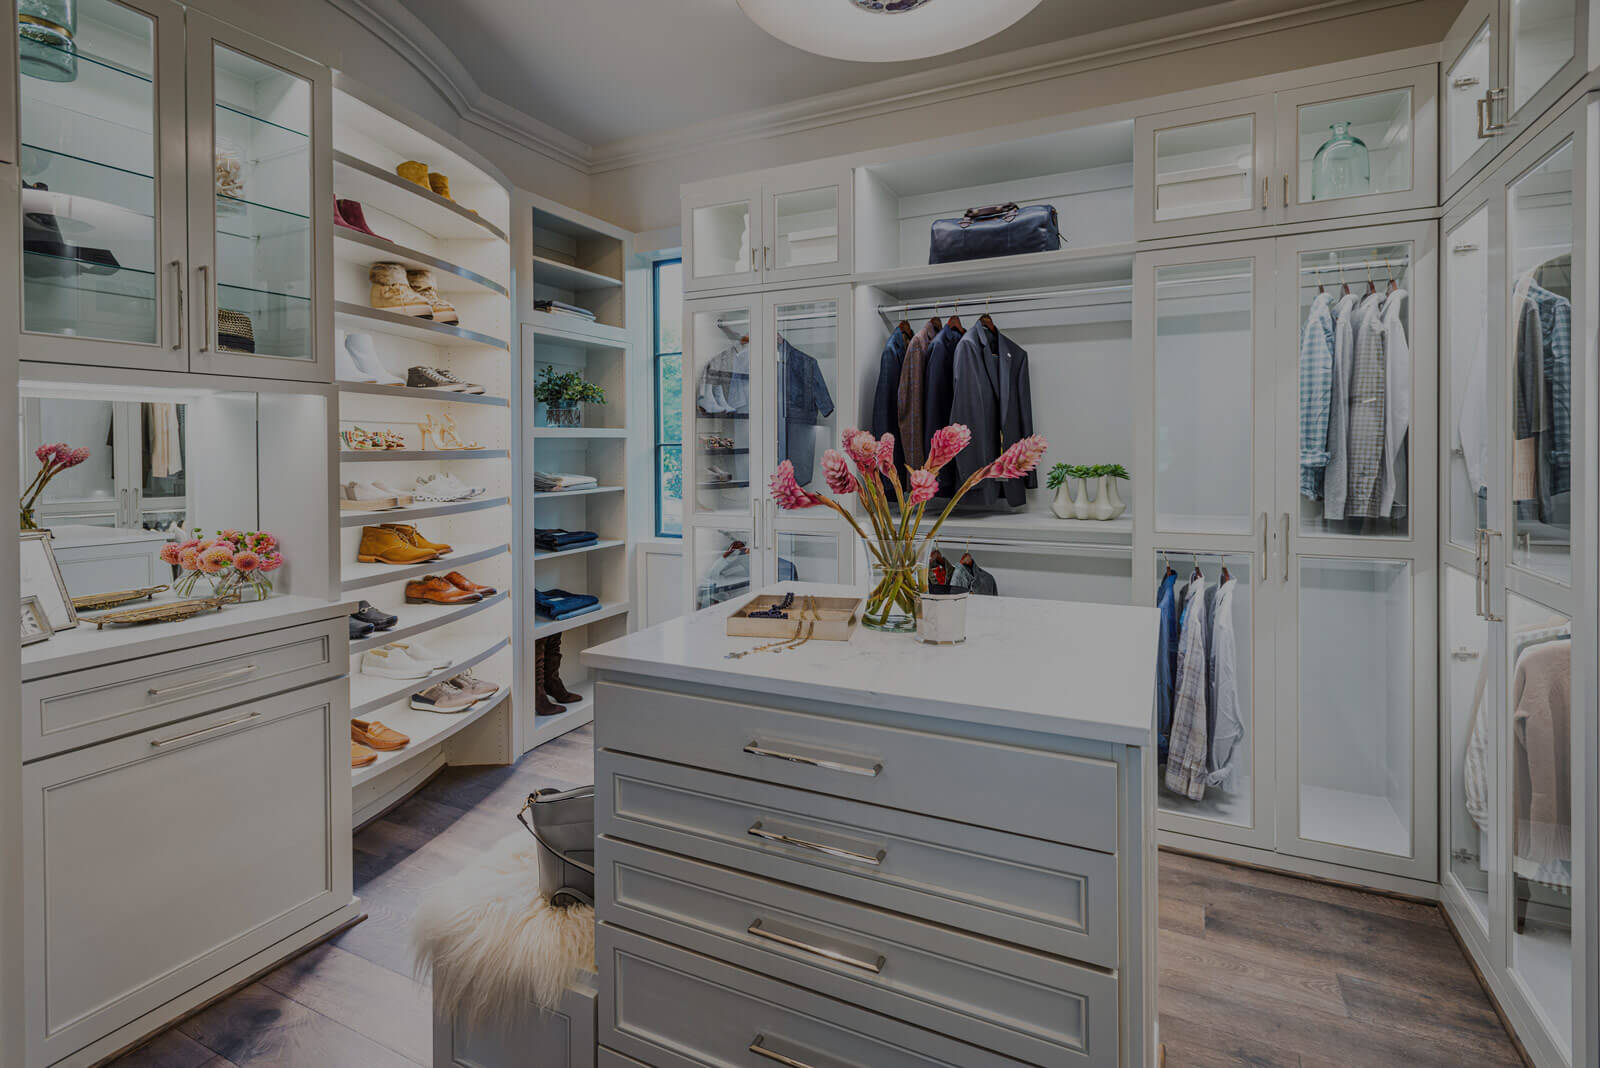 closet company custom california closets - The Closet Company